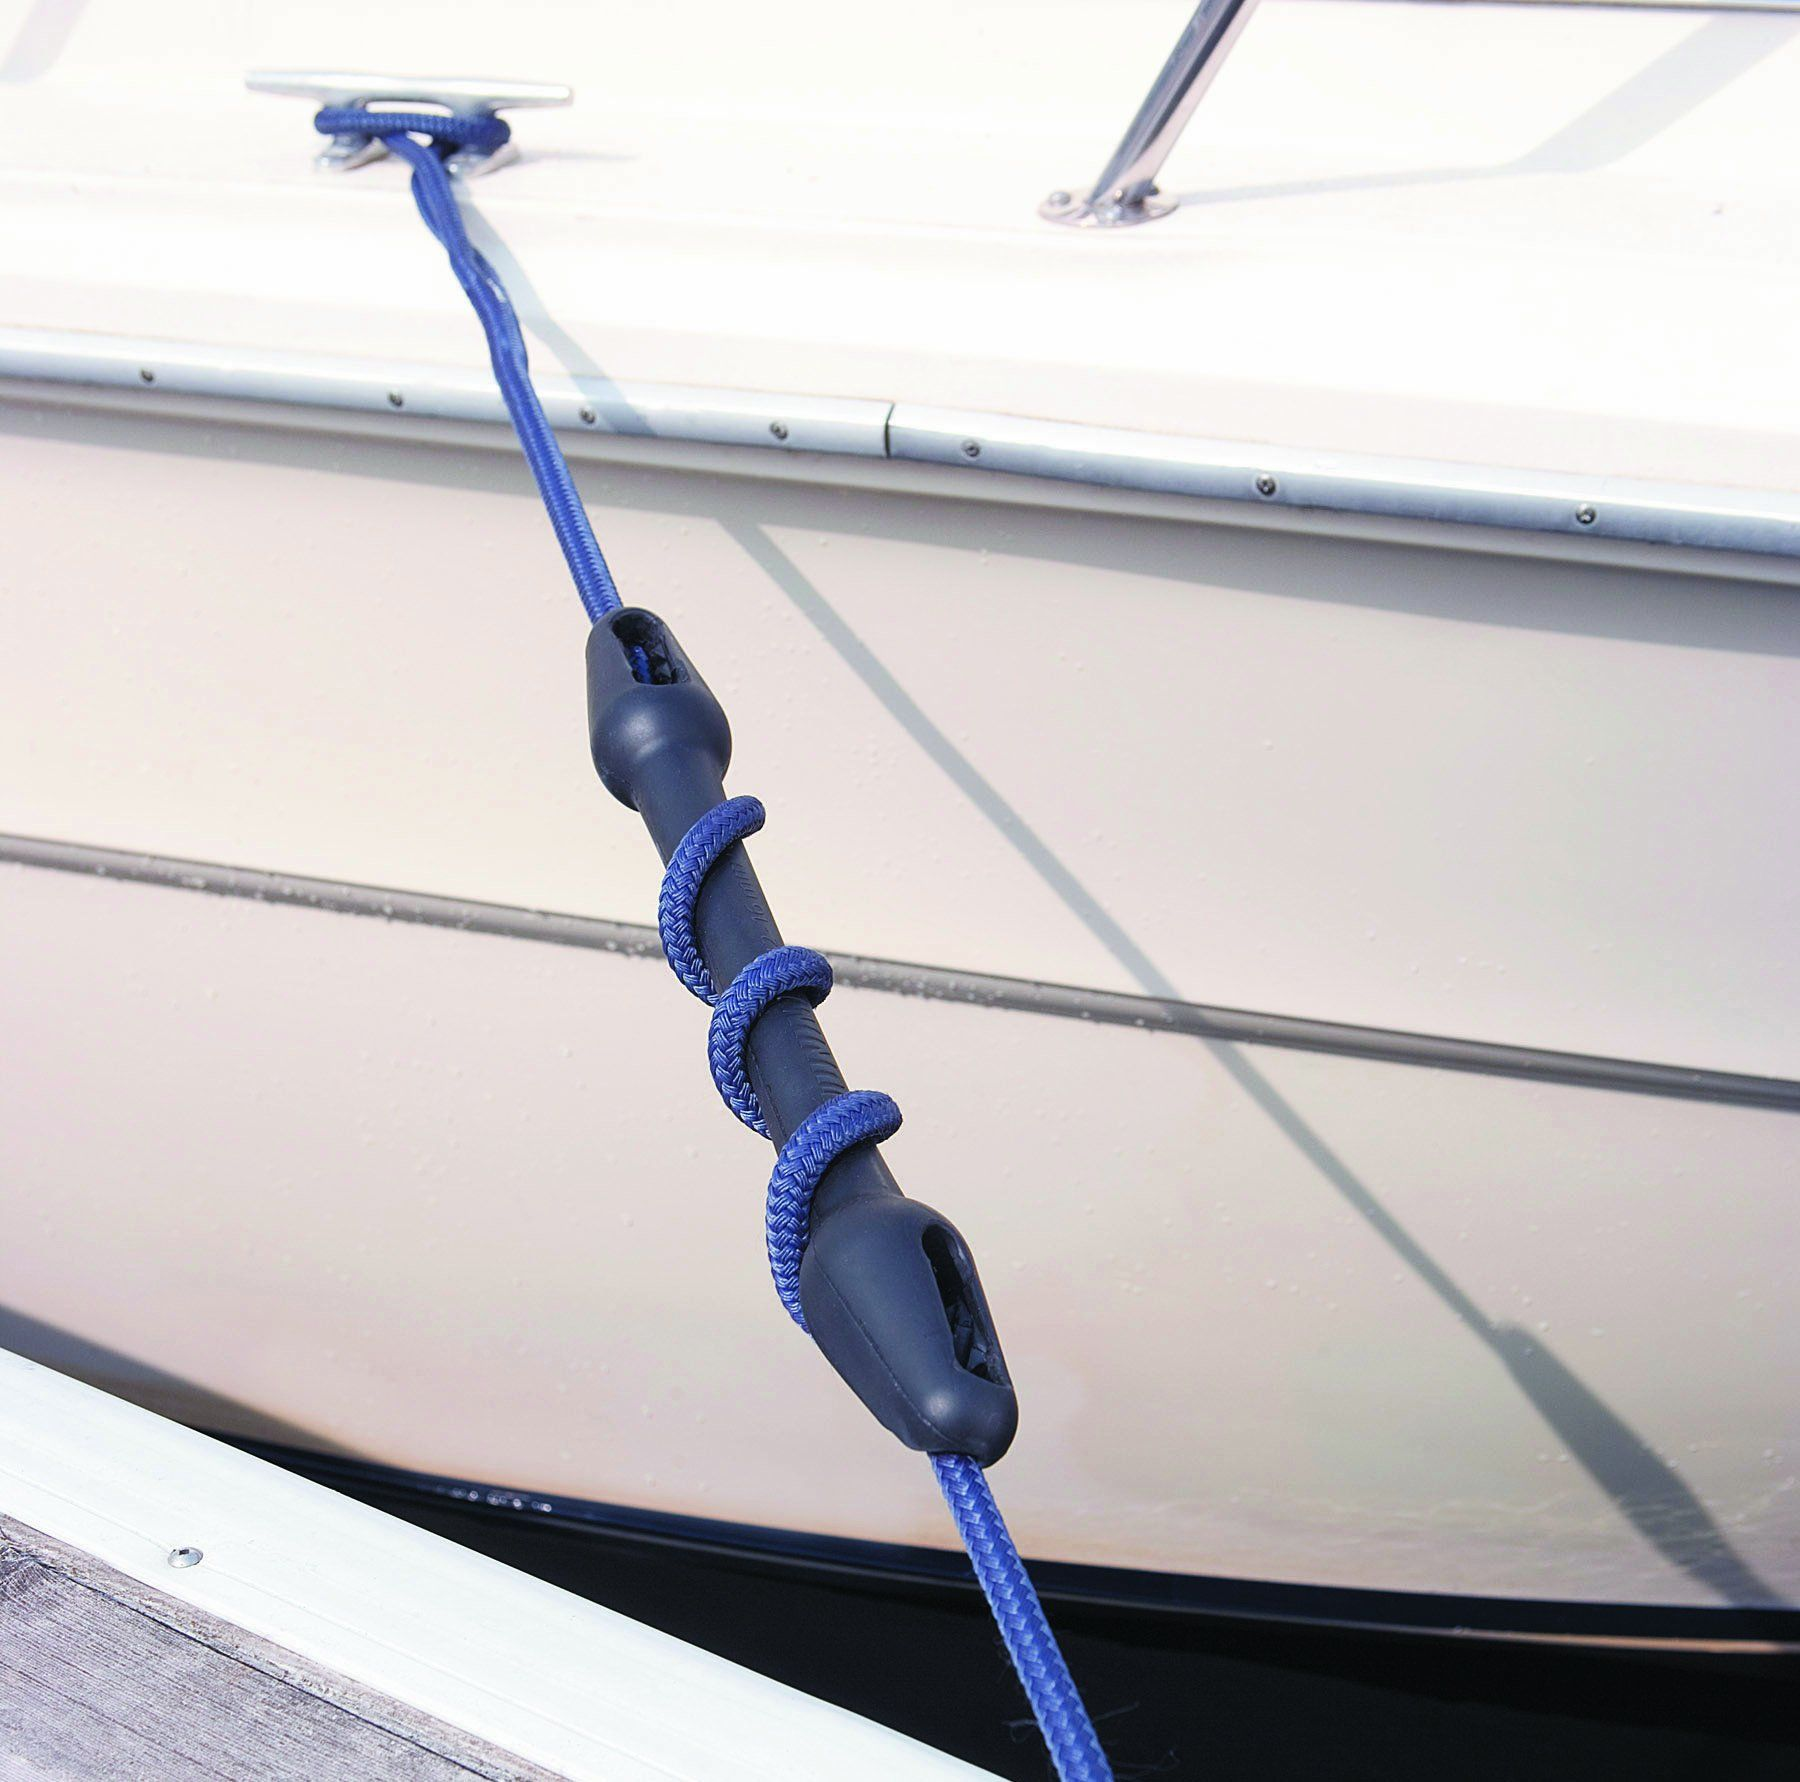 Amazon.com : Dock Edge + Inc. 7/16-5/8-Inch Boat Mooring Snubber (12-16 mm) : Boating Equipment : Sports & Outdoors